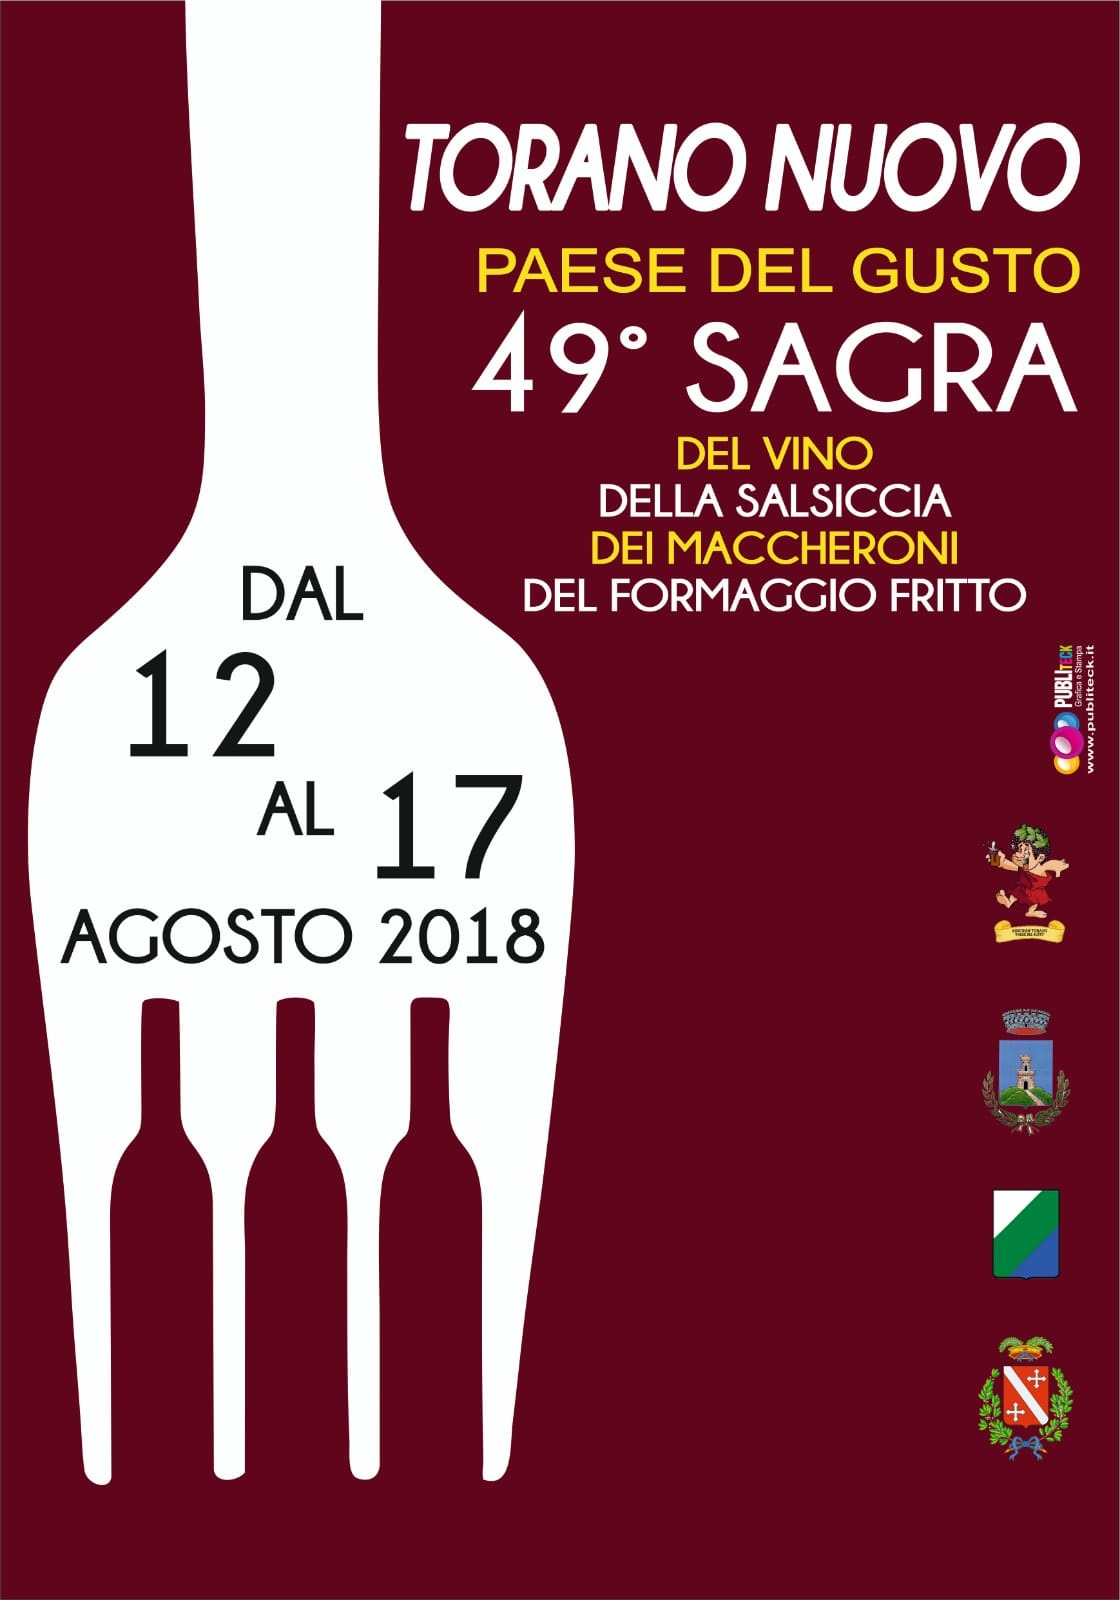 49^ Sagra Torano Nuovo 2018 dal 12 - 17 Agosto